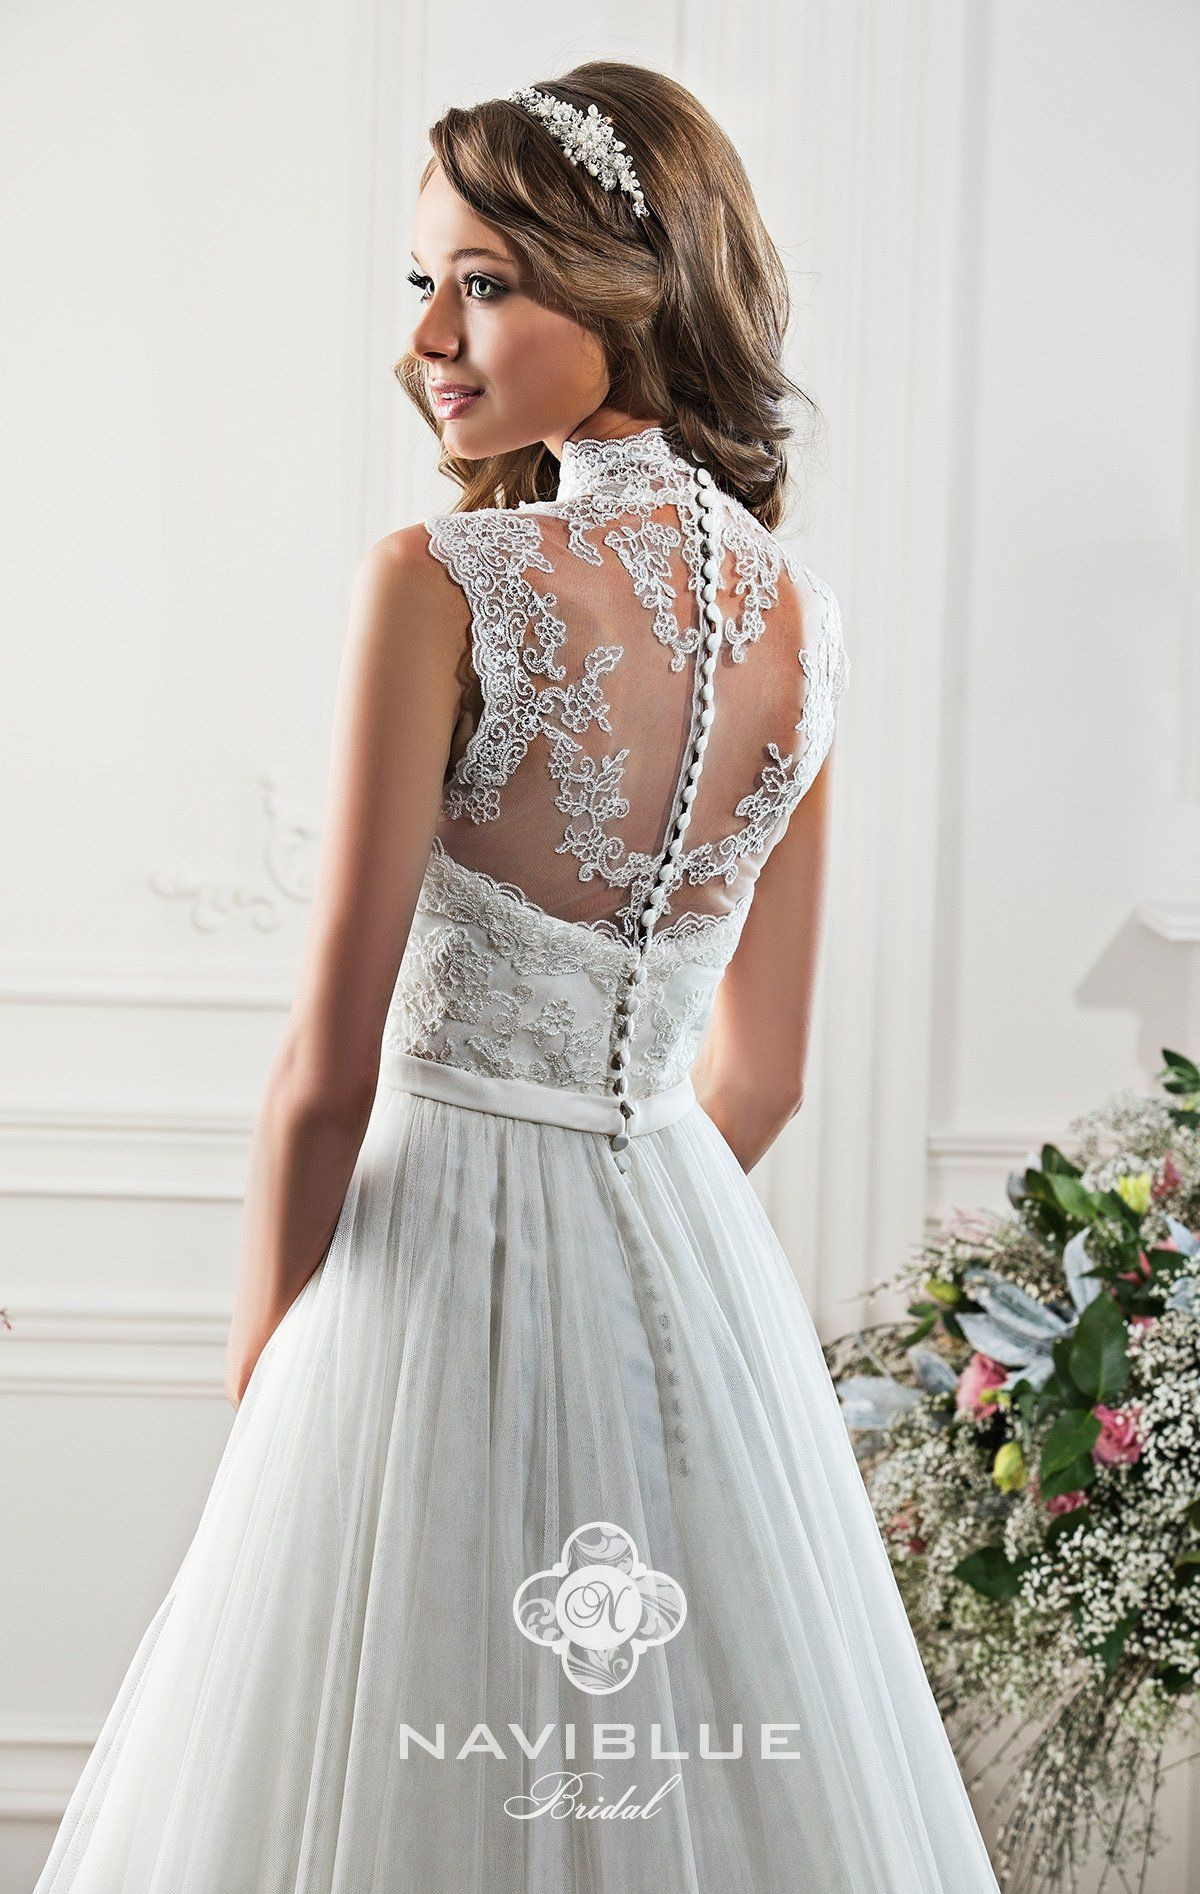 Brautkleid Jena Www.lavie-Brautmode.de | High Collar Wedding